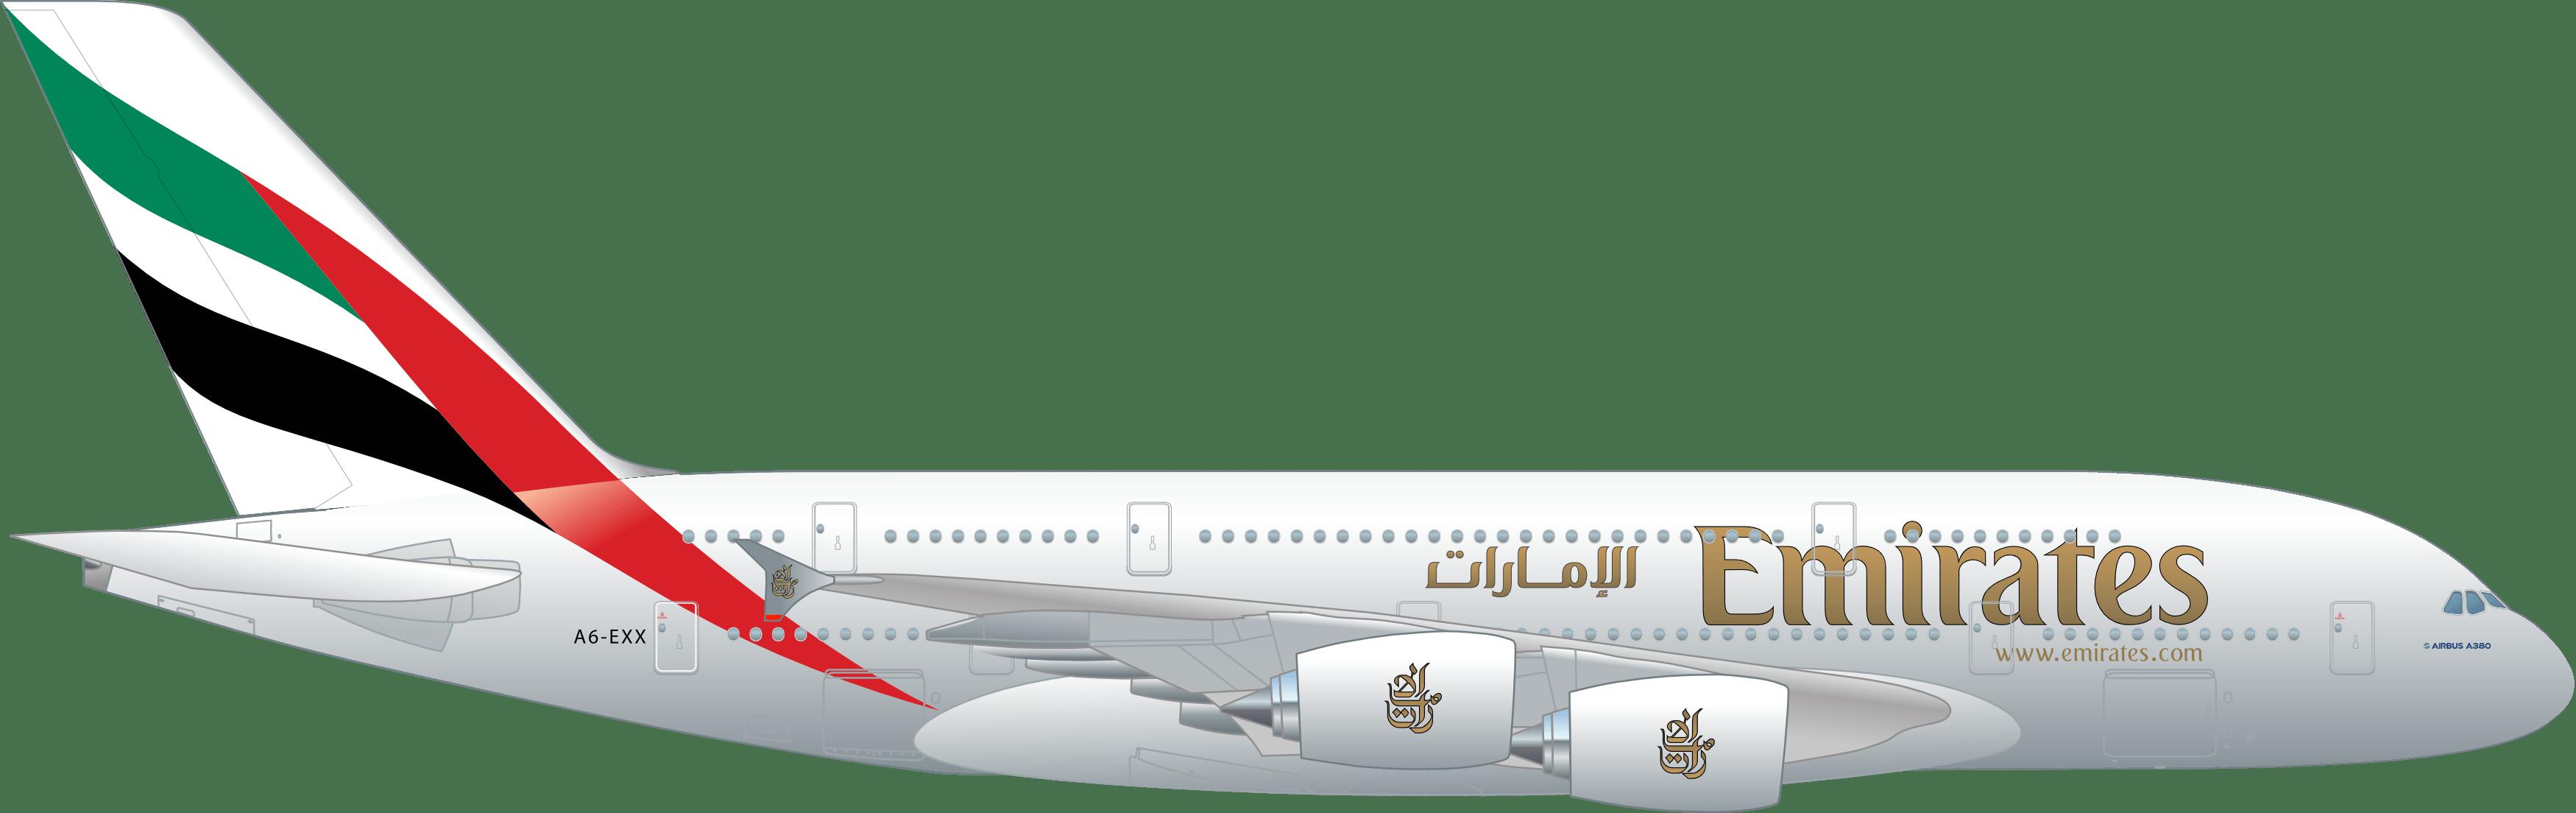 Emirates A380 transparent PNG.